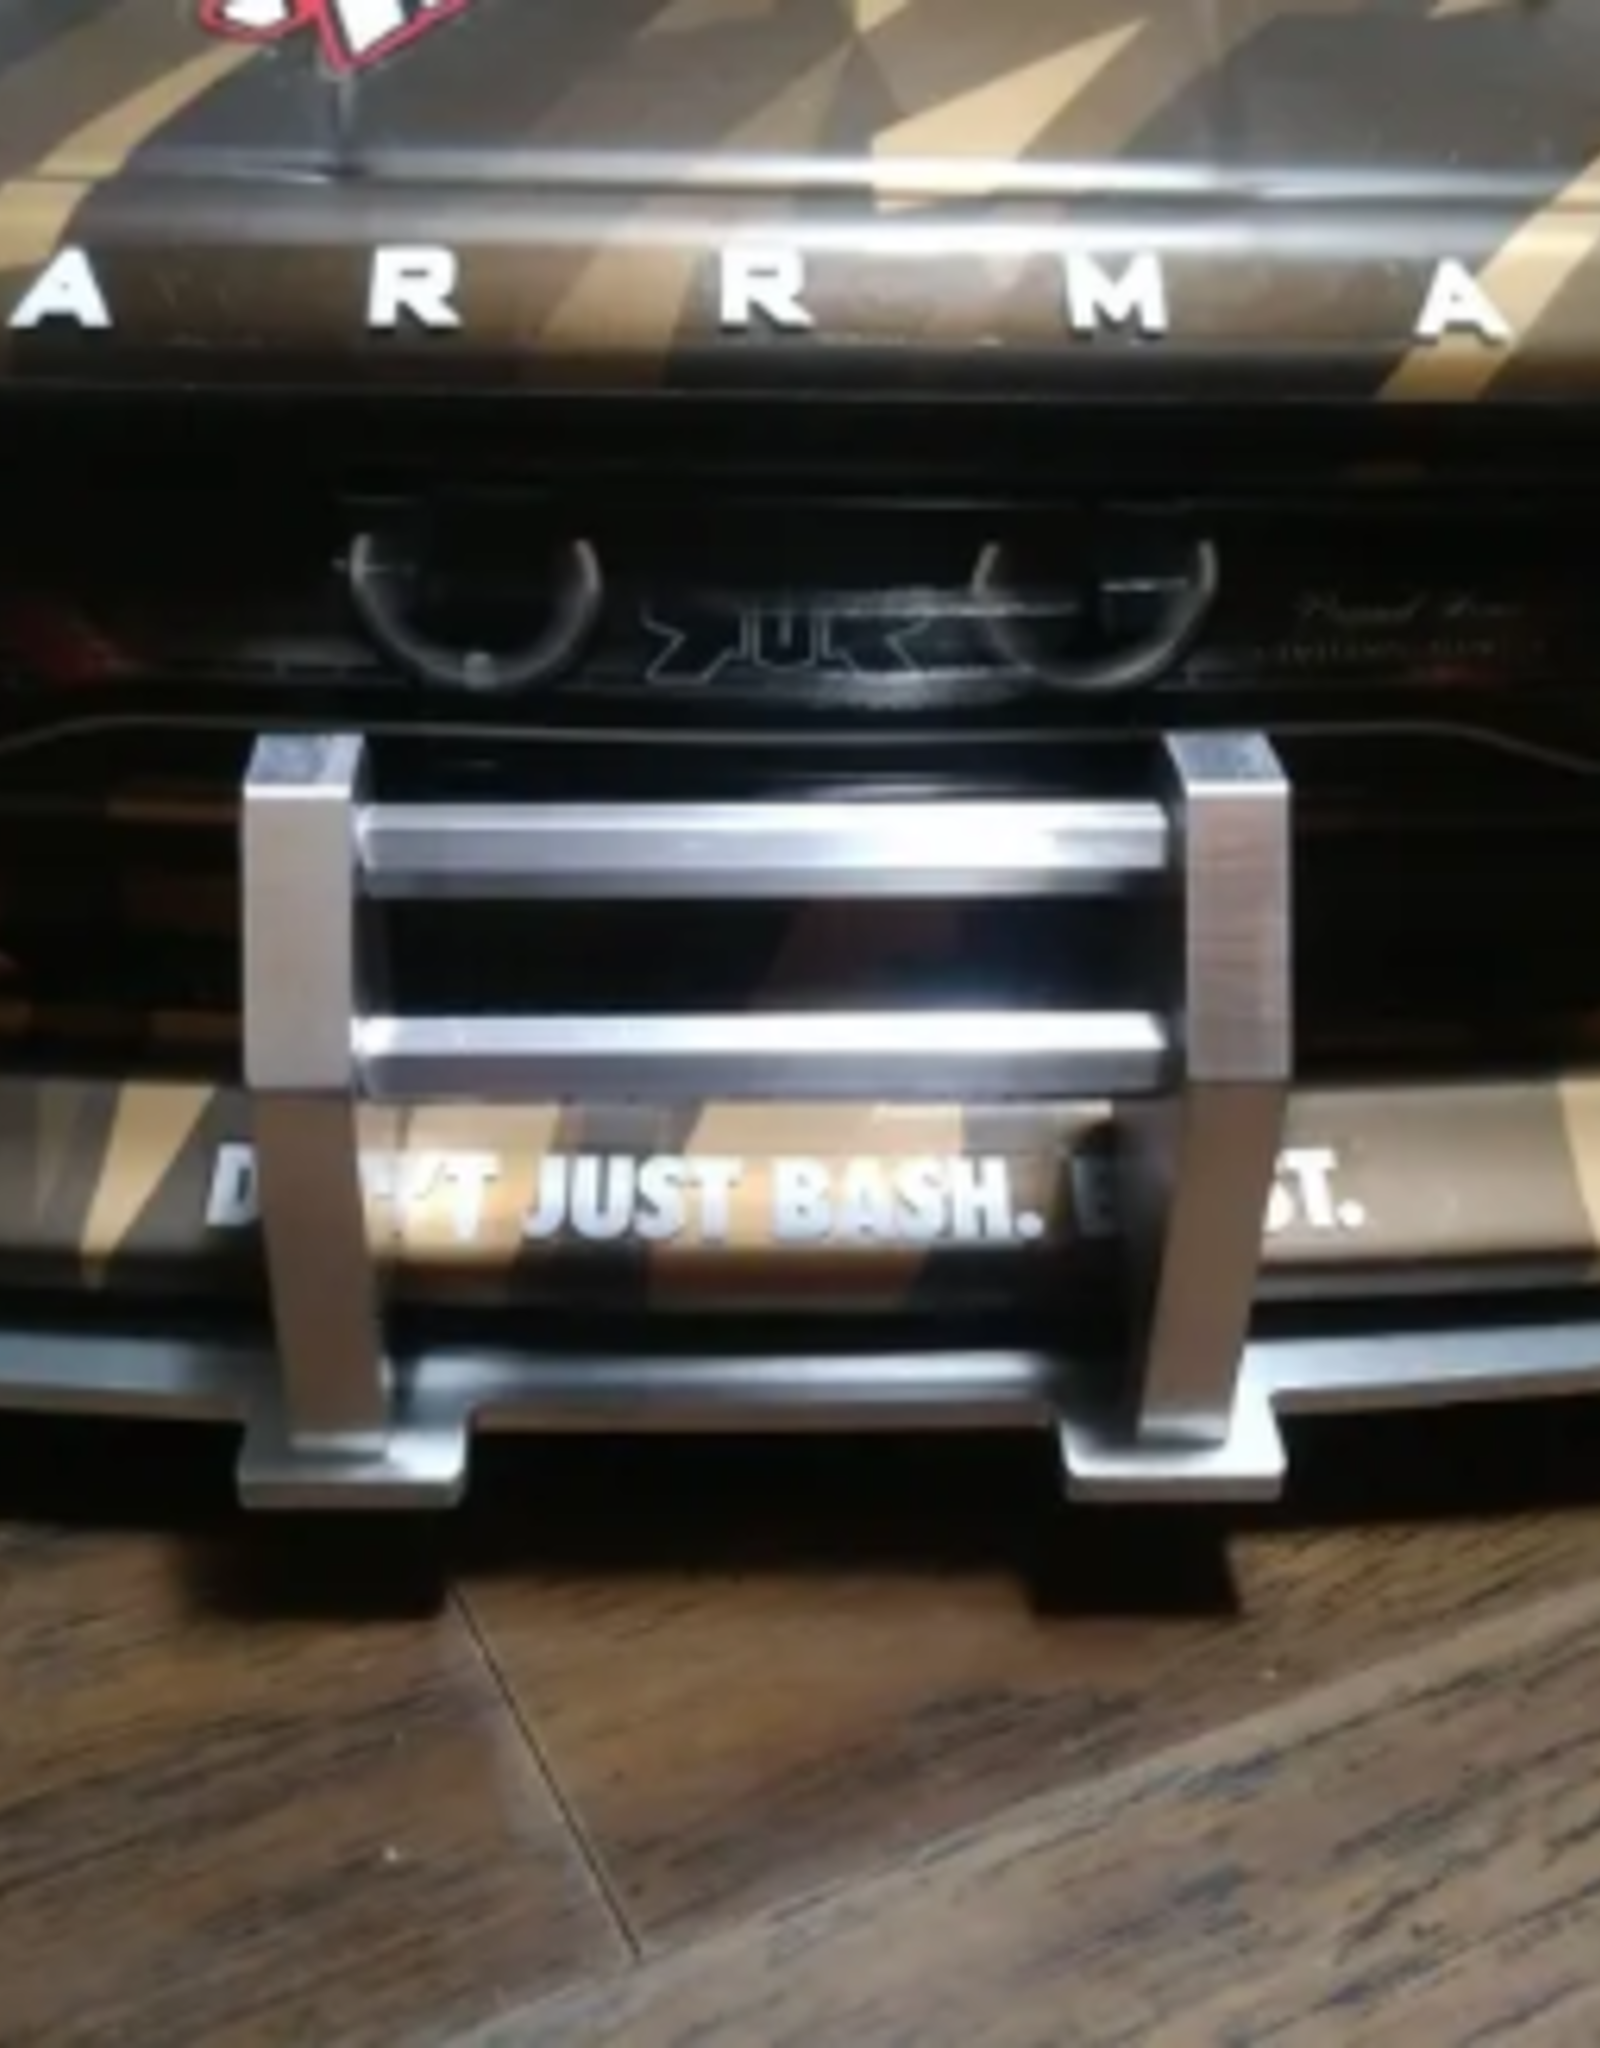 RC Speed Monsters RSM ARRMA Infraction Crash Bumper